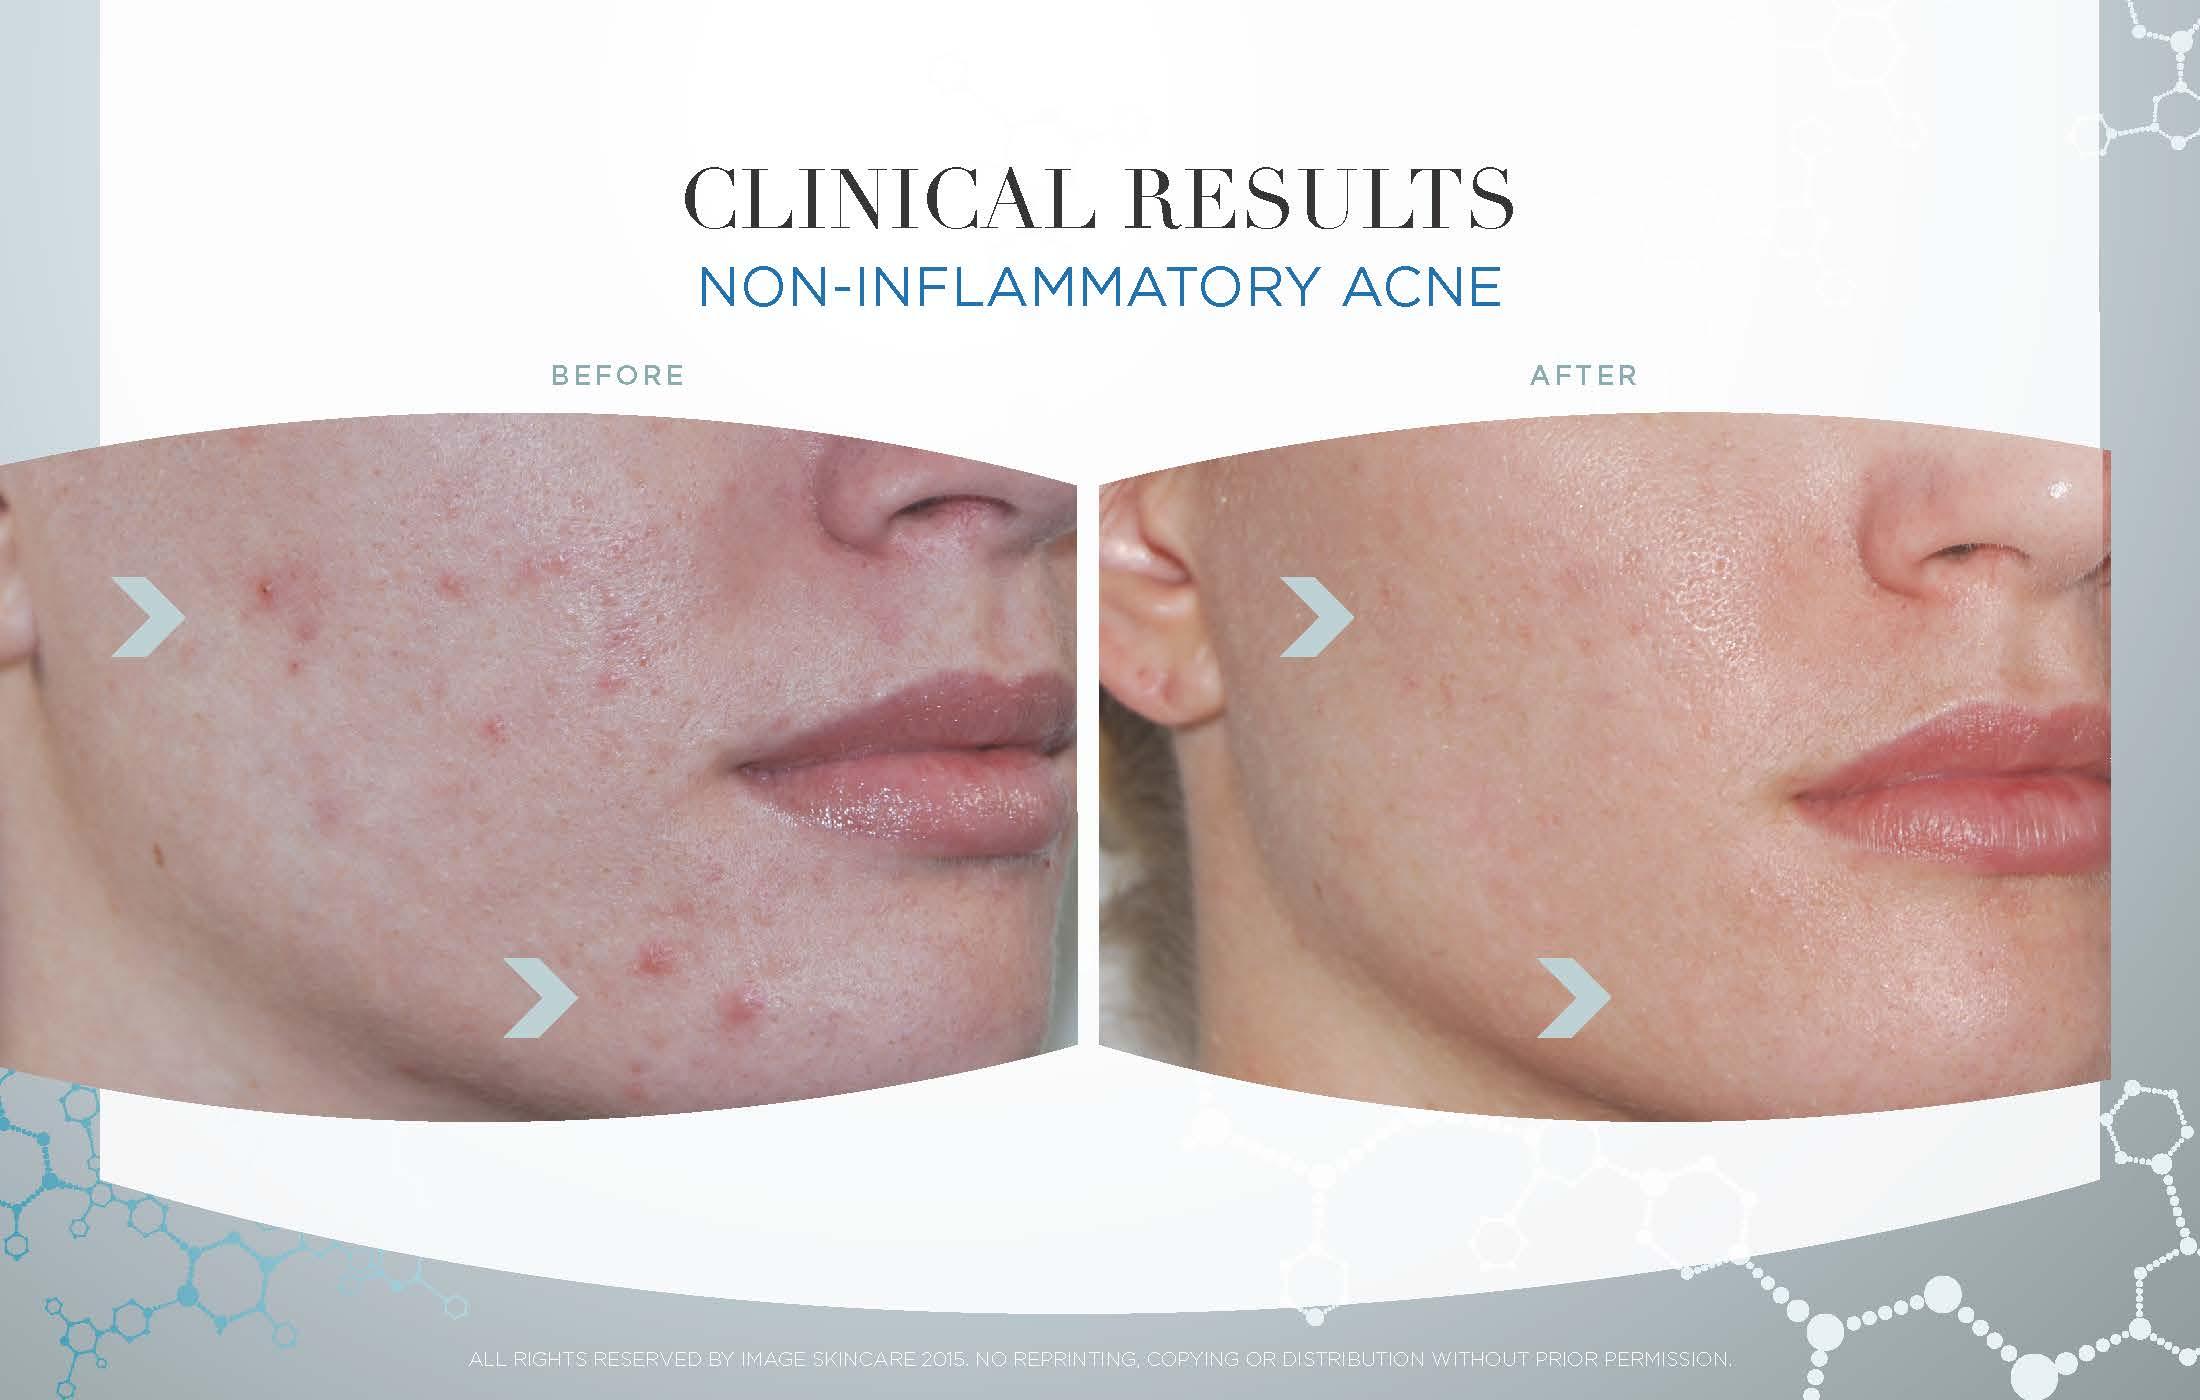 Image Skincare Fresno Mystique Medical Spa